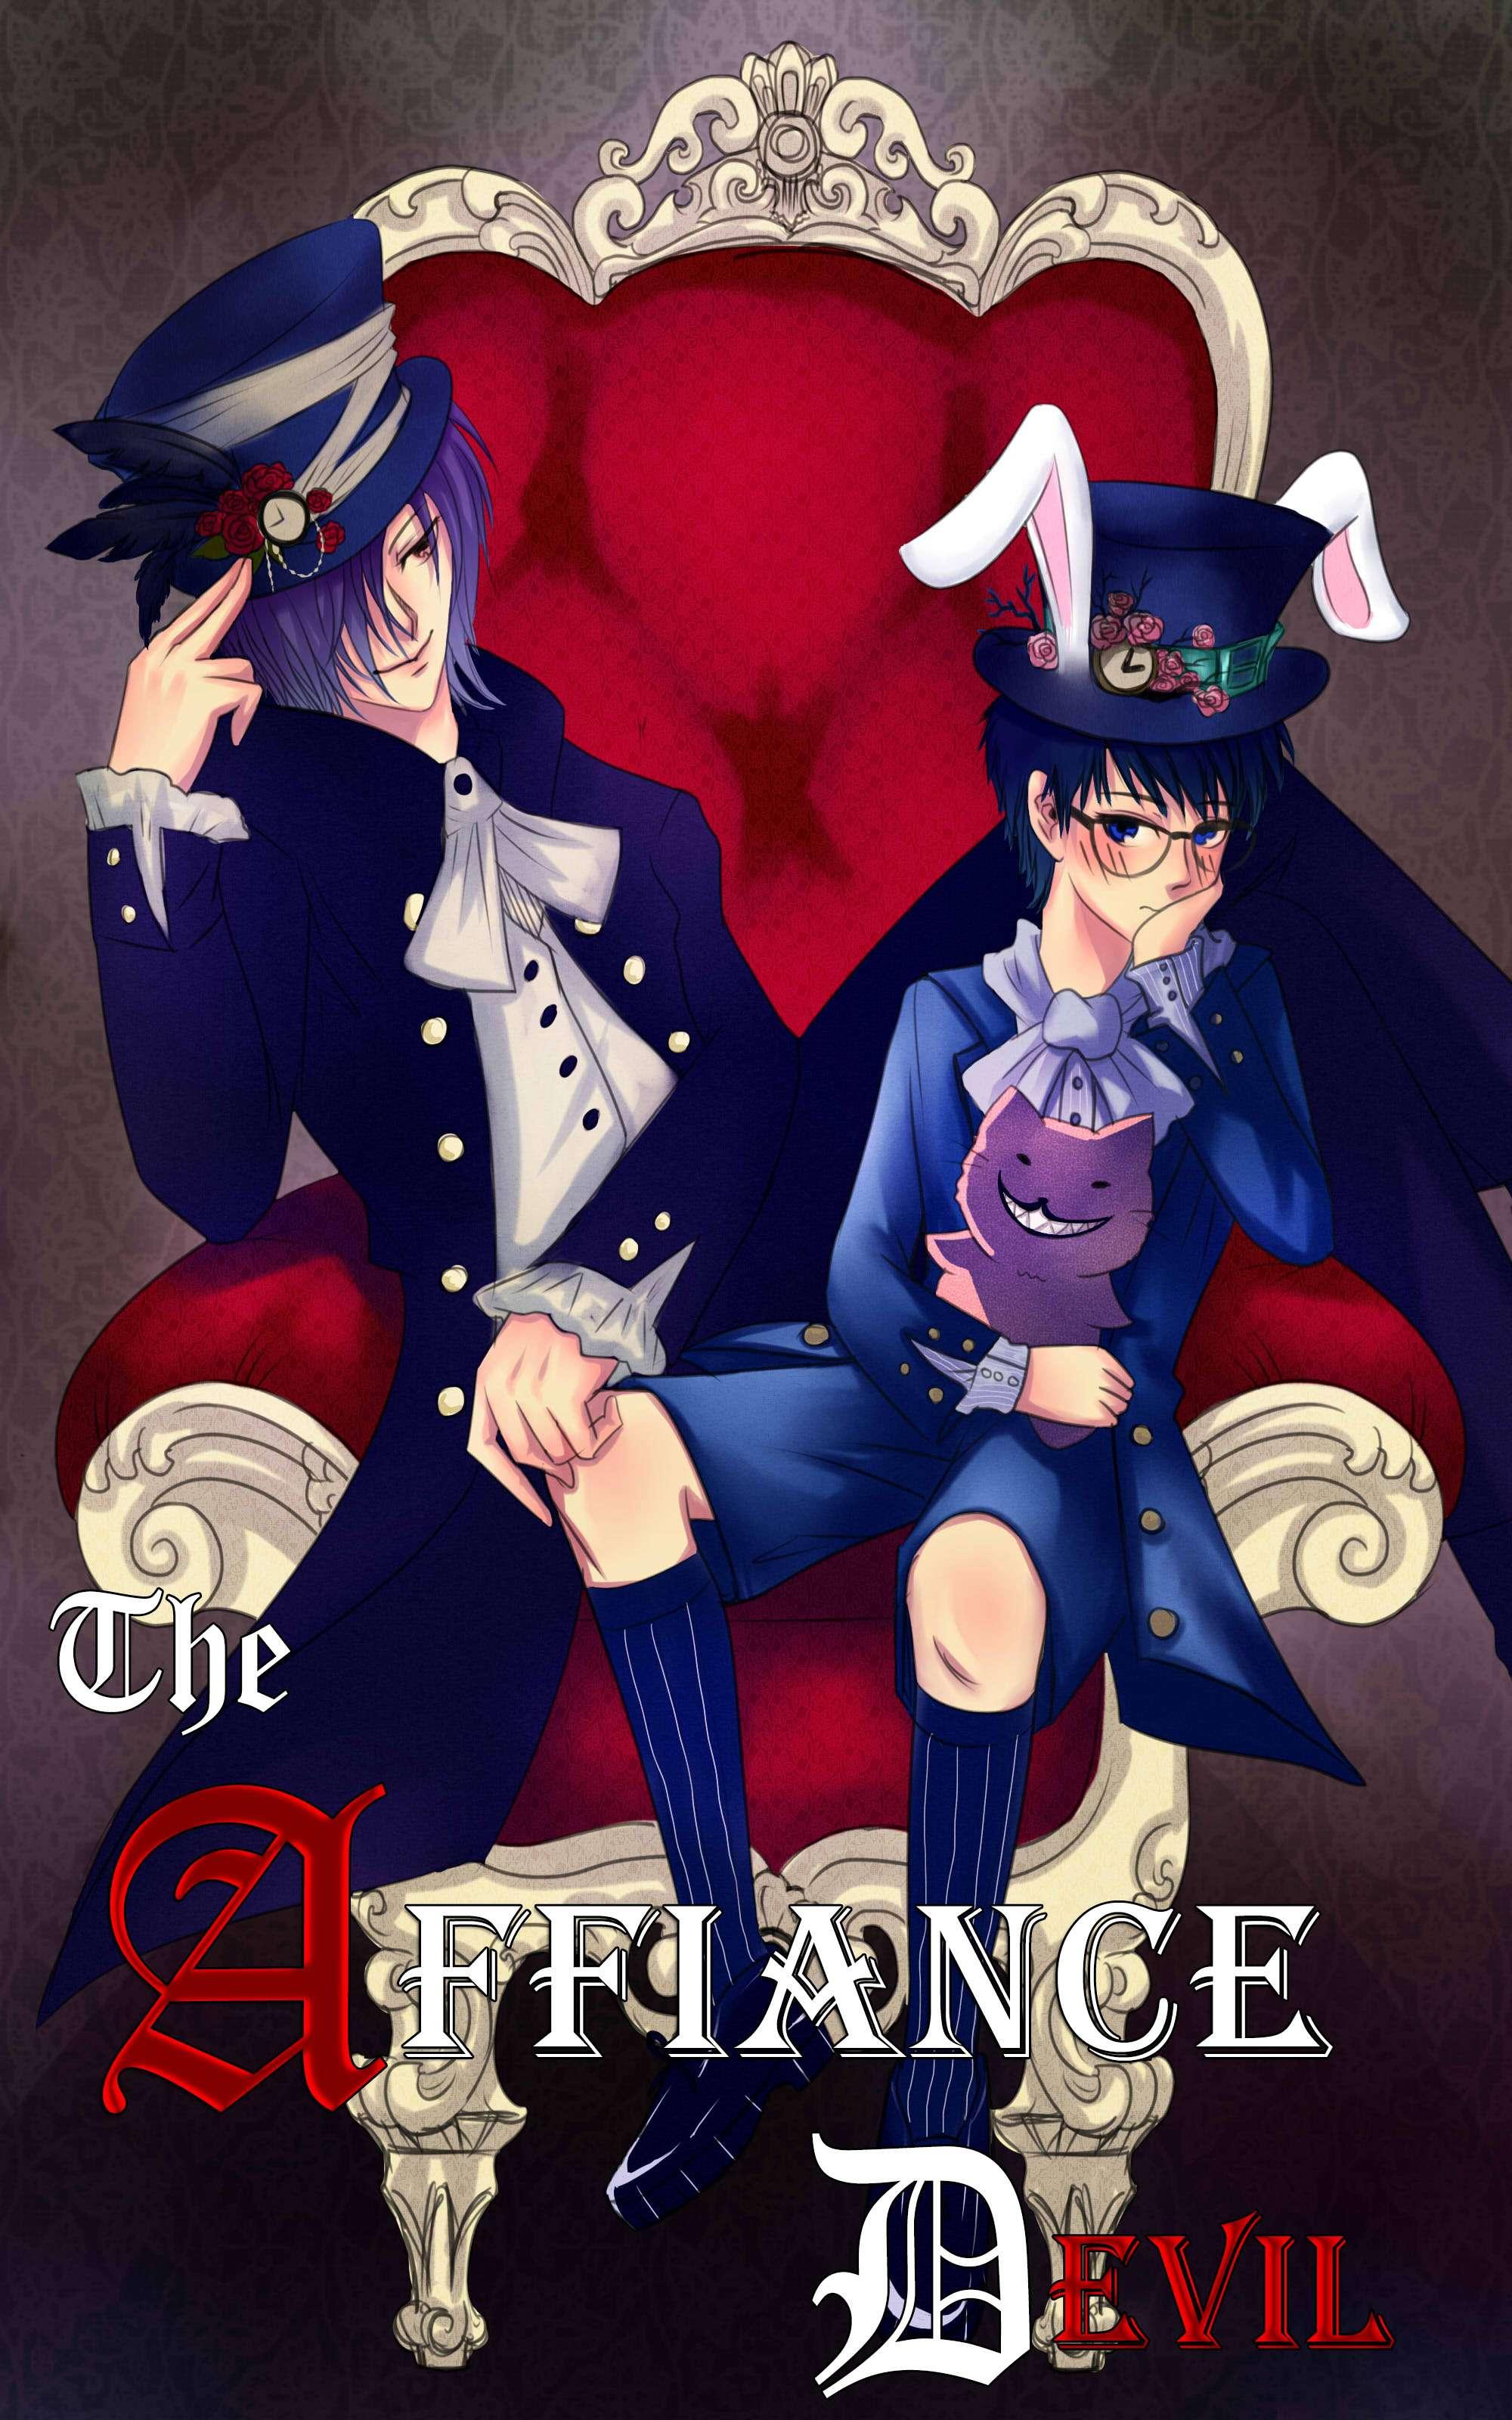 the affiance devil (secret love)